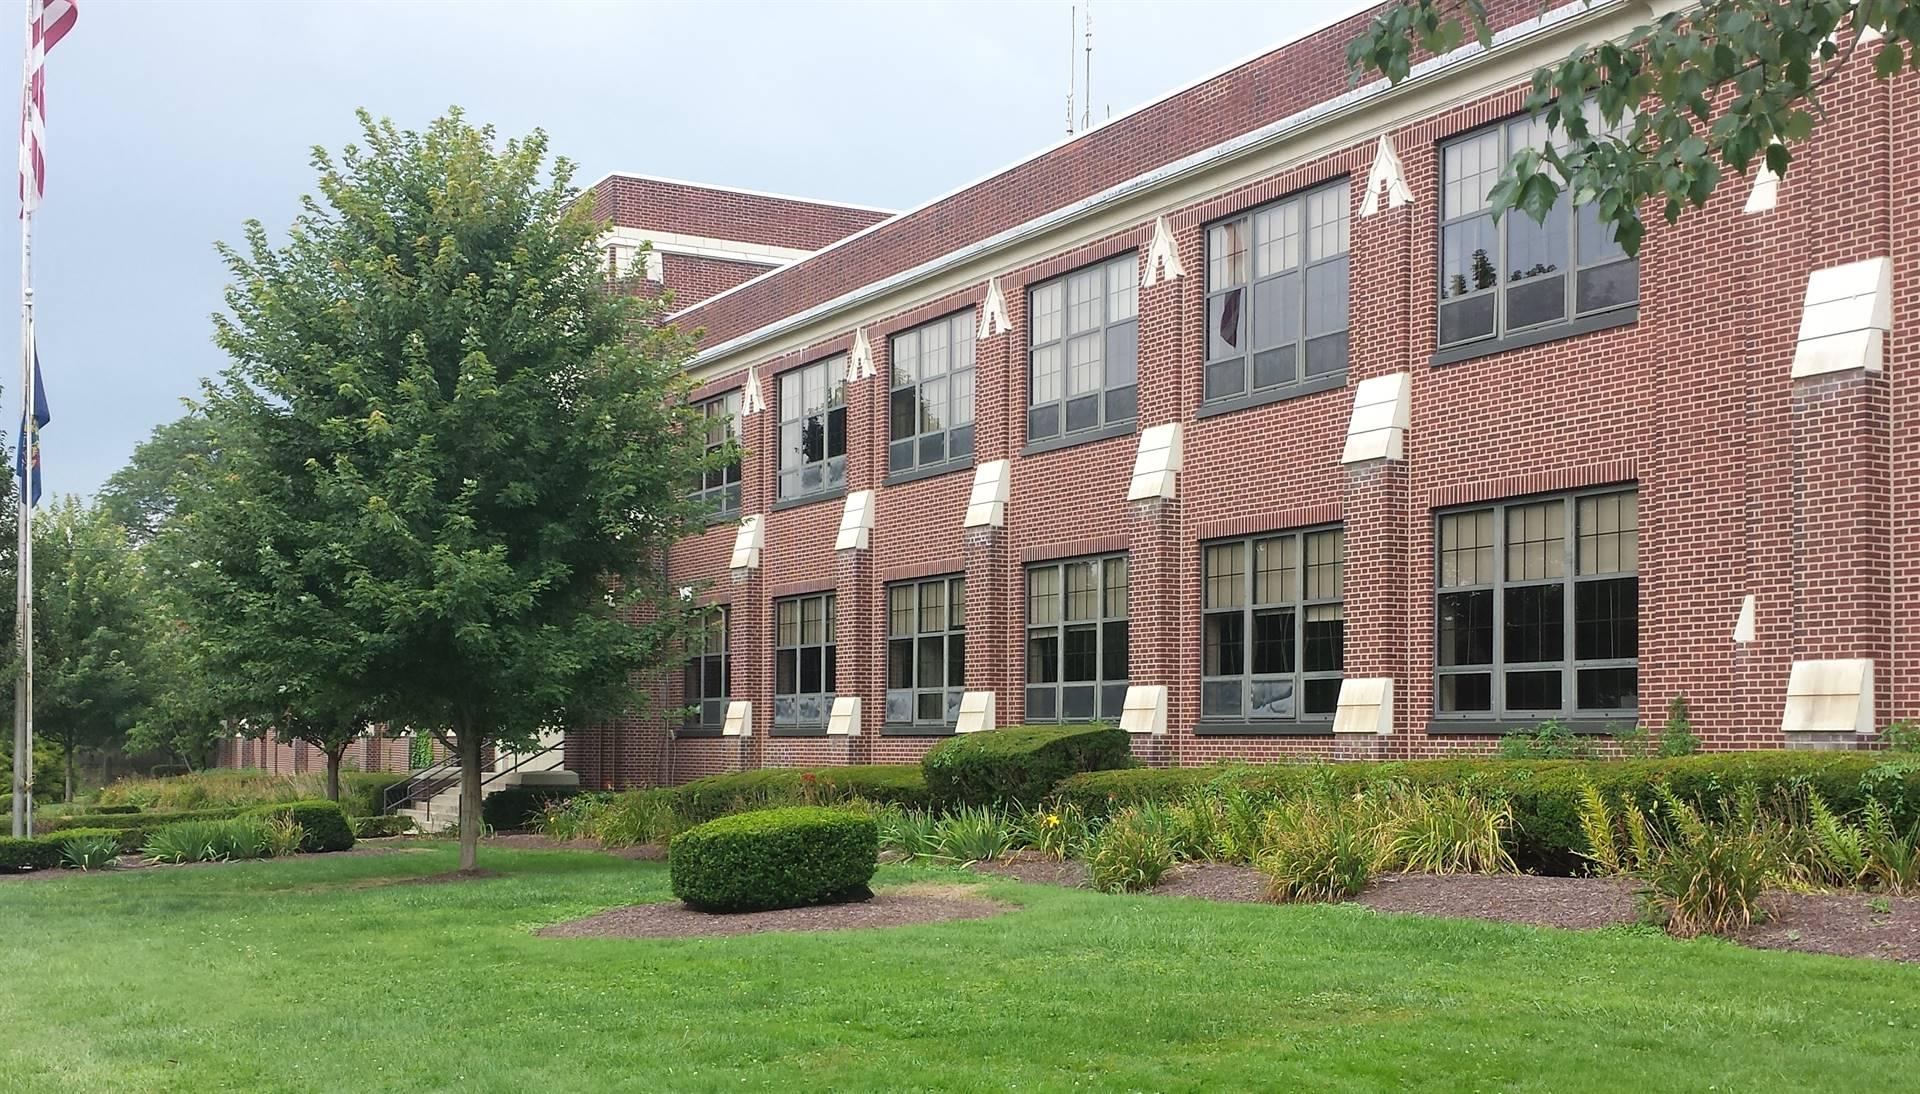 Tenth Street Elementary